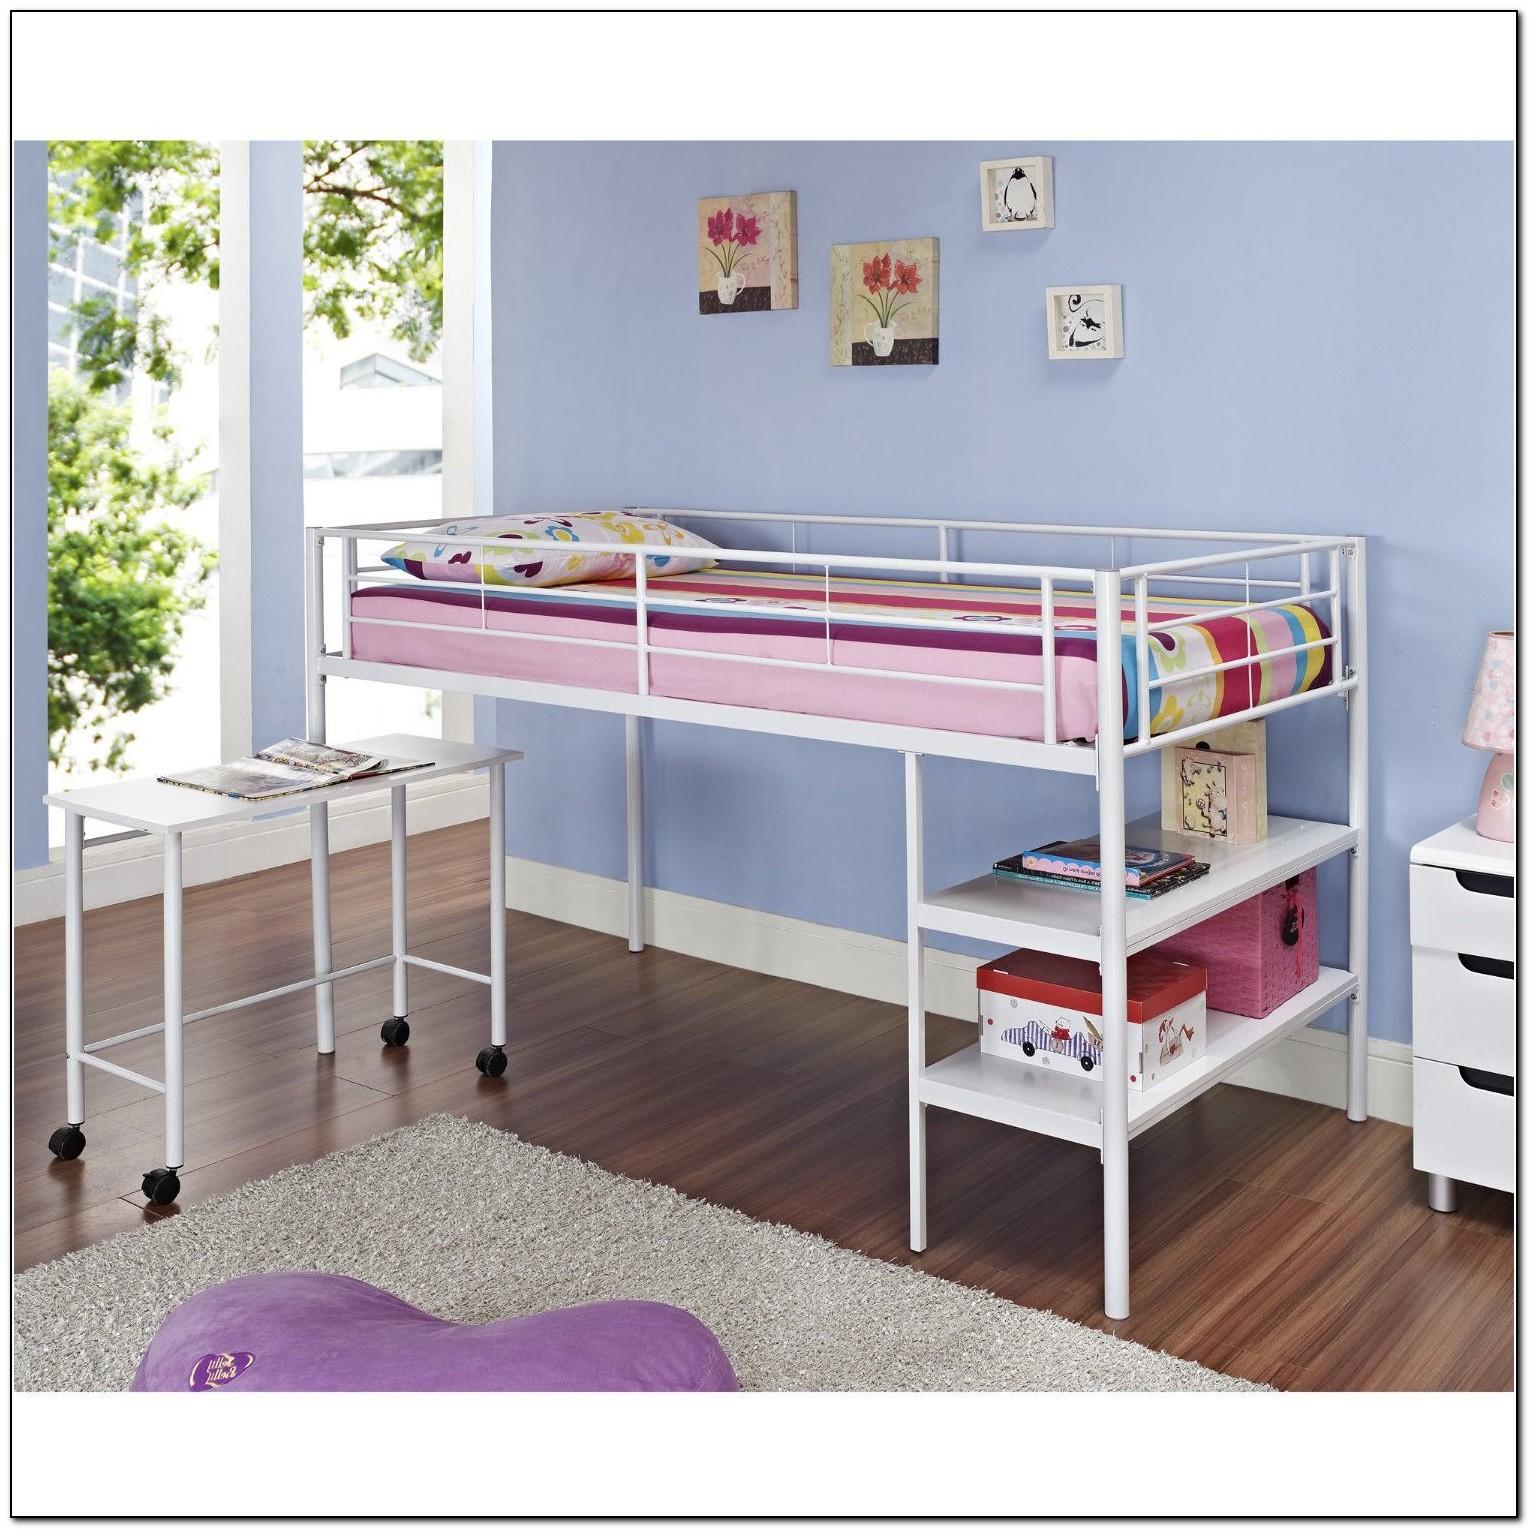 Ikea Twin Loft Bed With Desk